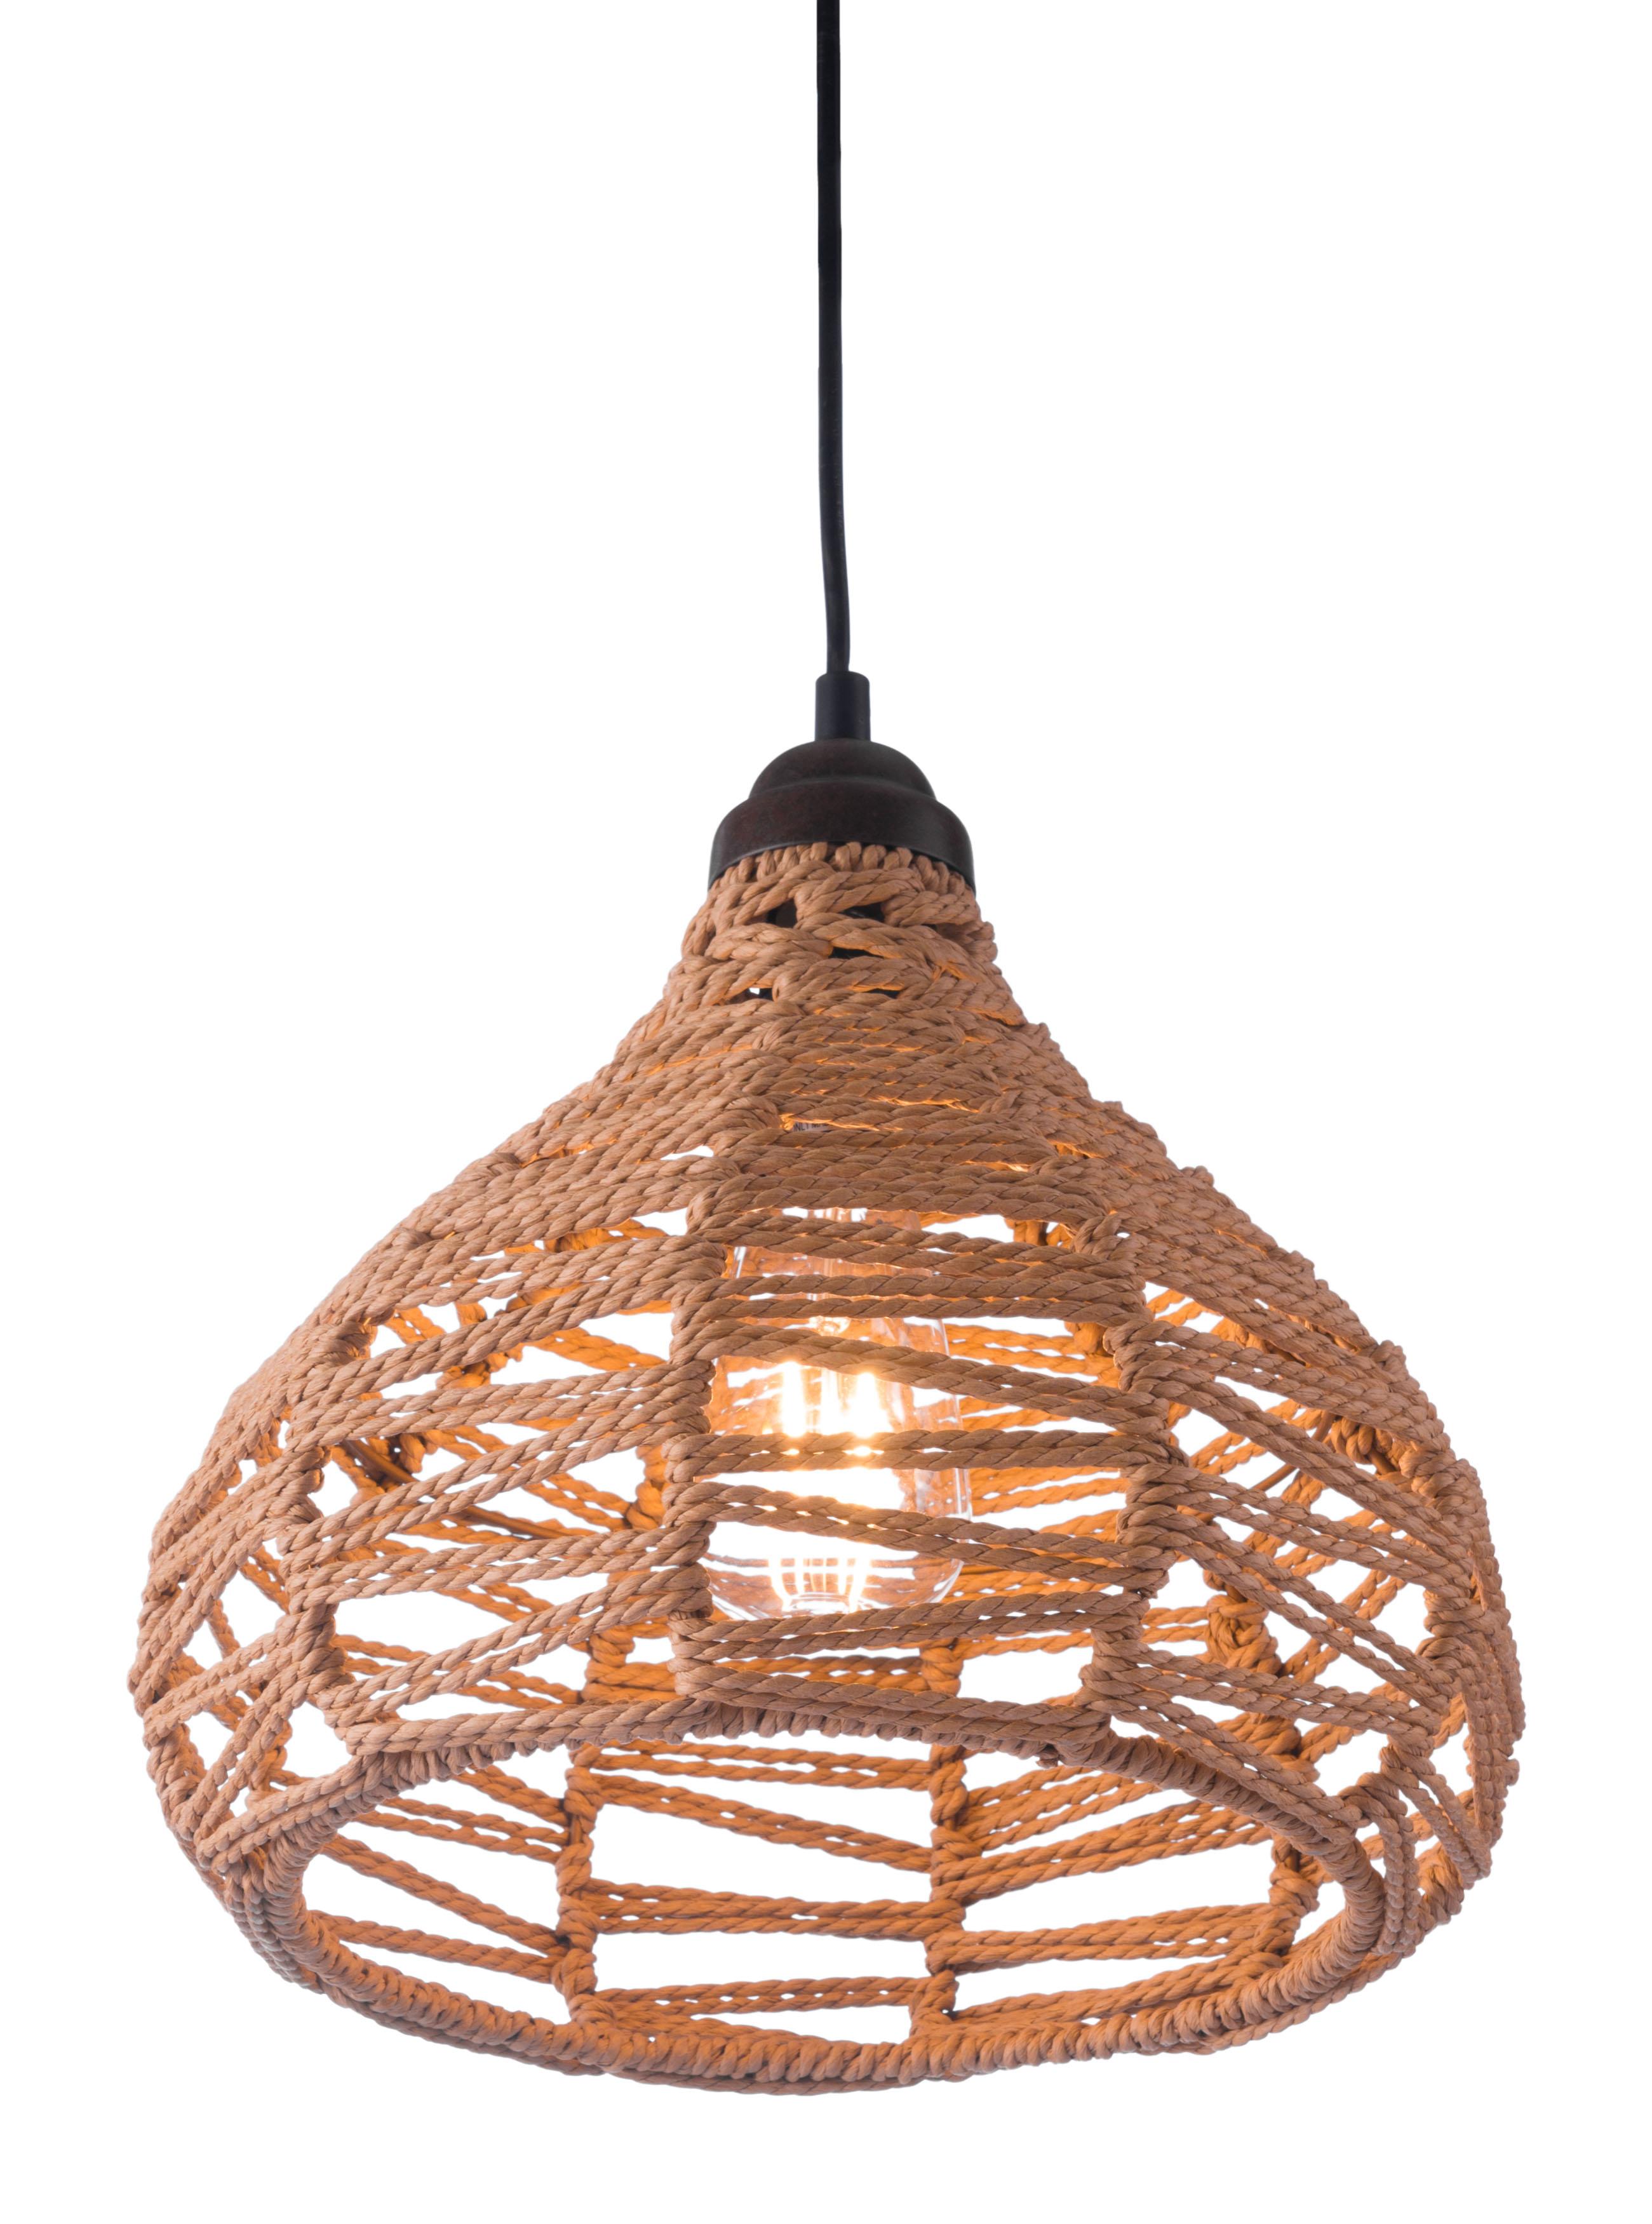 56016-zuo-nezz-ceiling-lamp.jpg